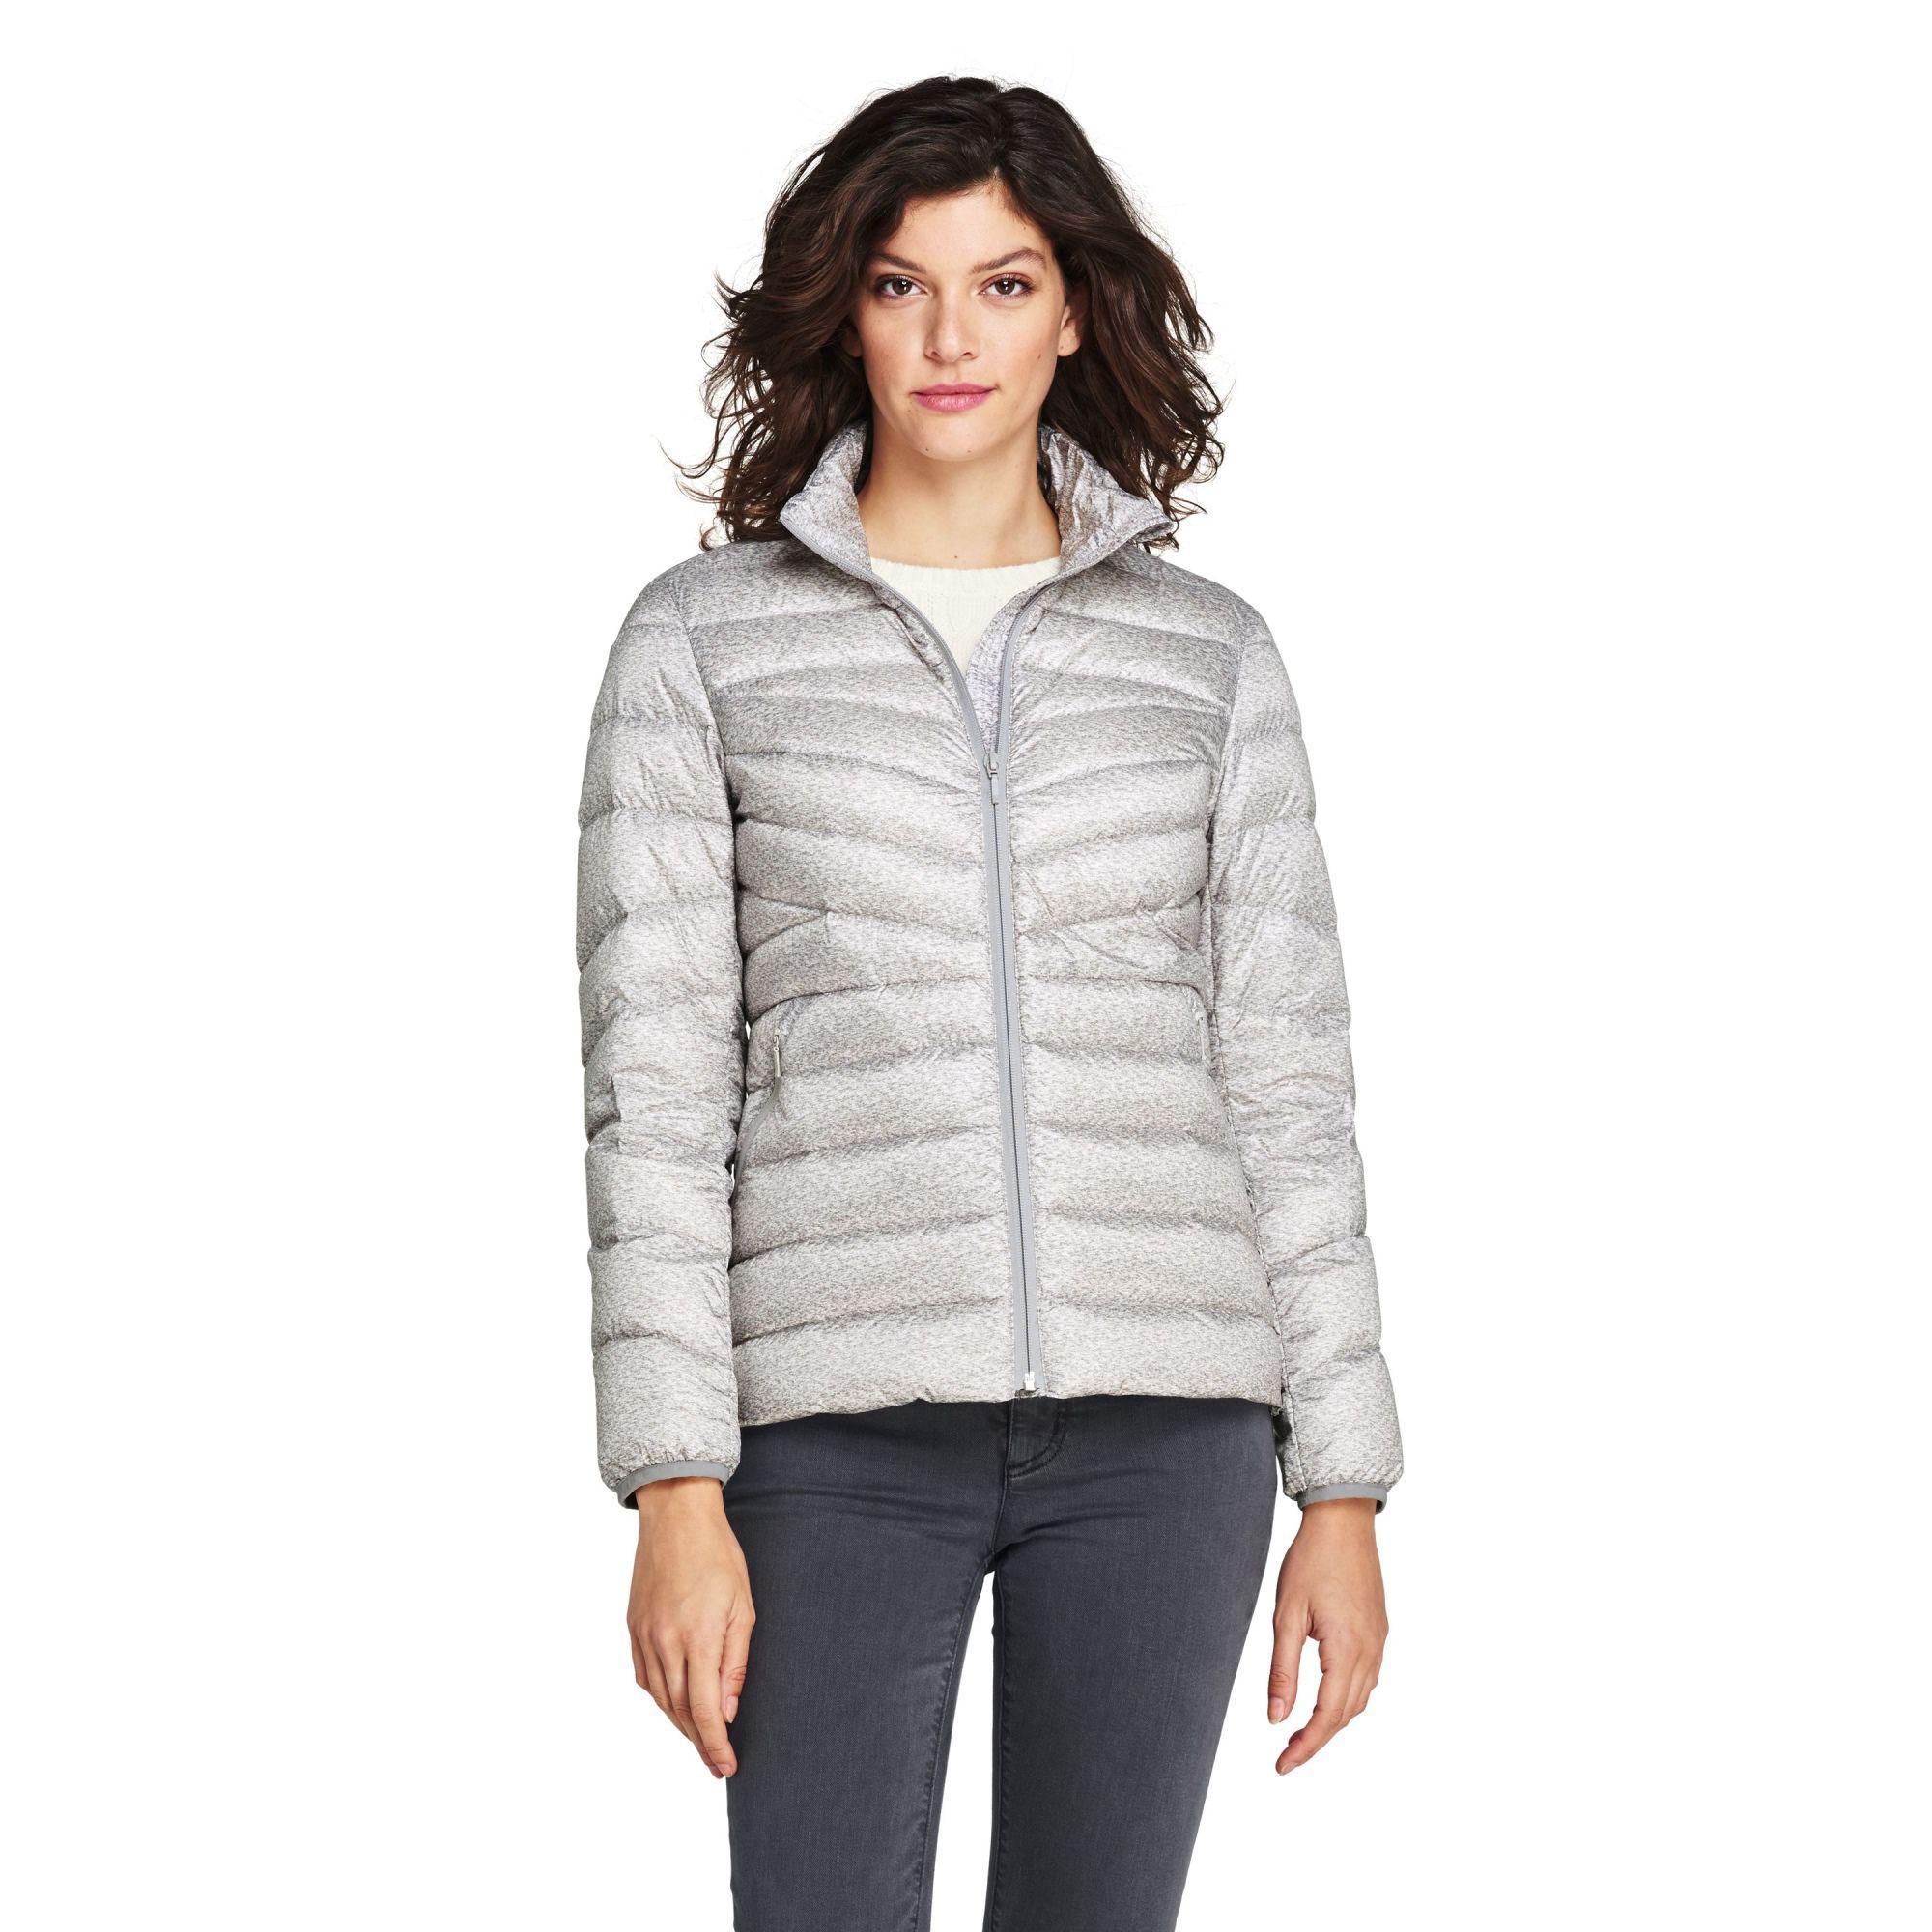 69c0210b62d Lands' End. Women's Gray Grey Patterned Ultra Light Packable Down Jacket